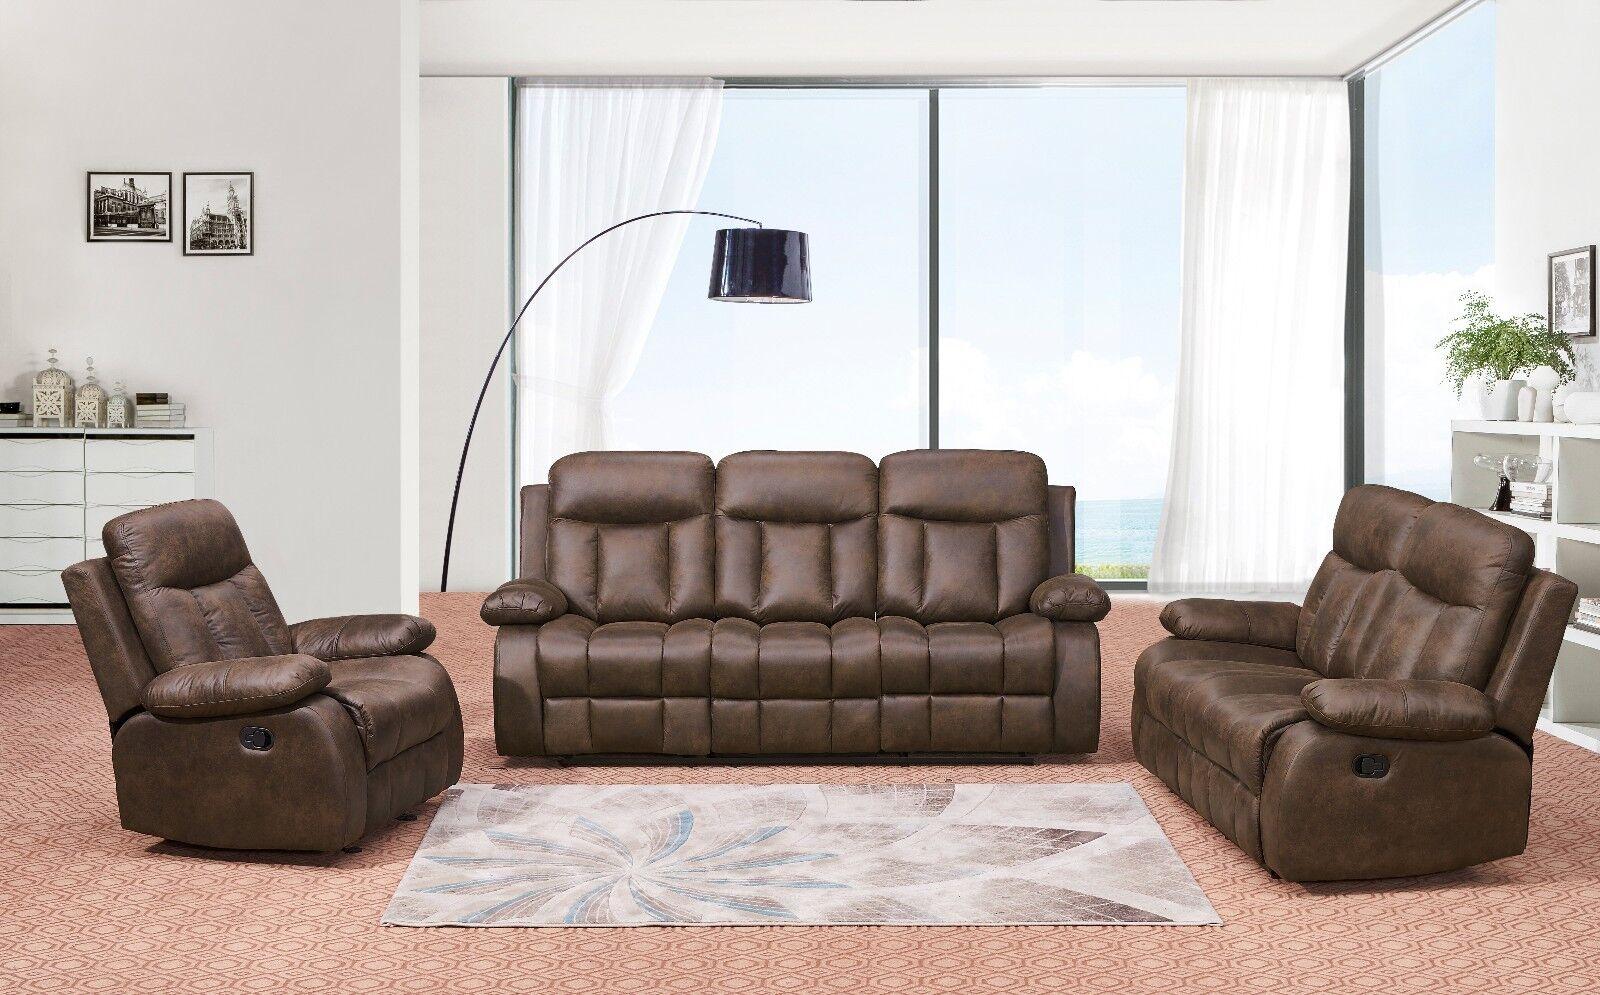 Betsy Furniture 3-PC Recliner Sofa Set Living Room Microfibe